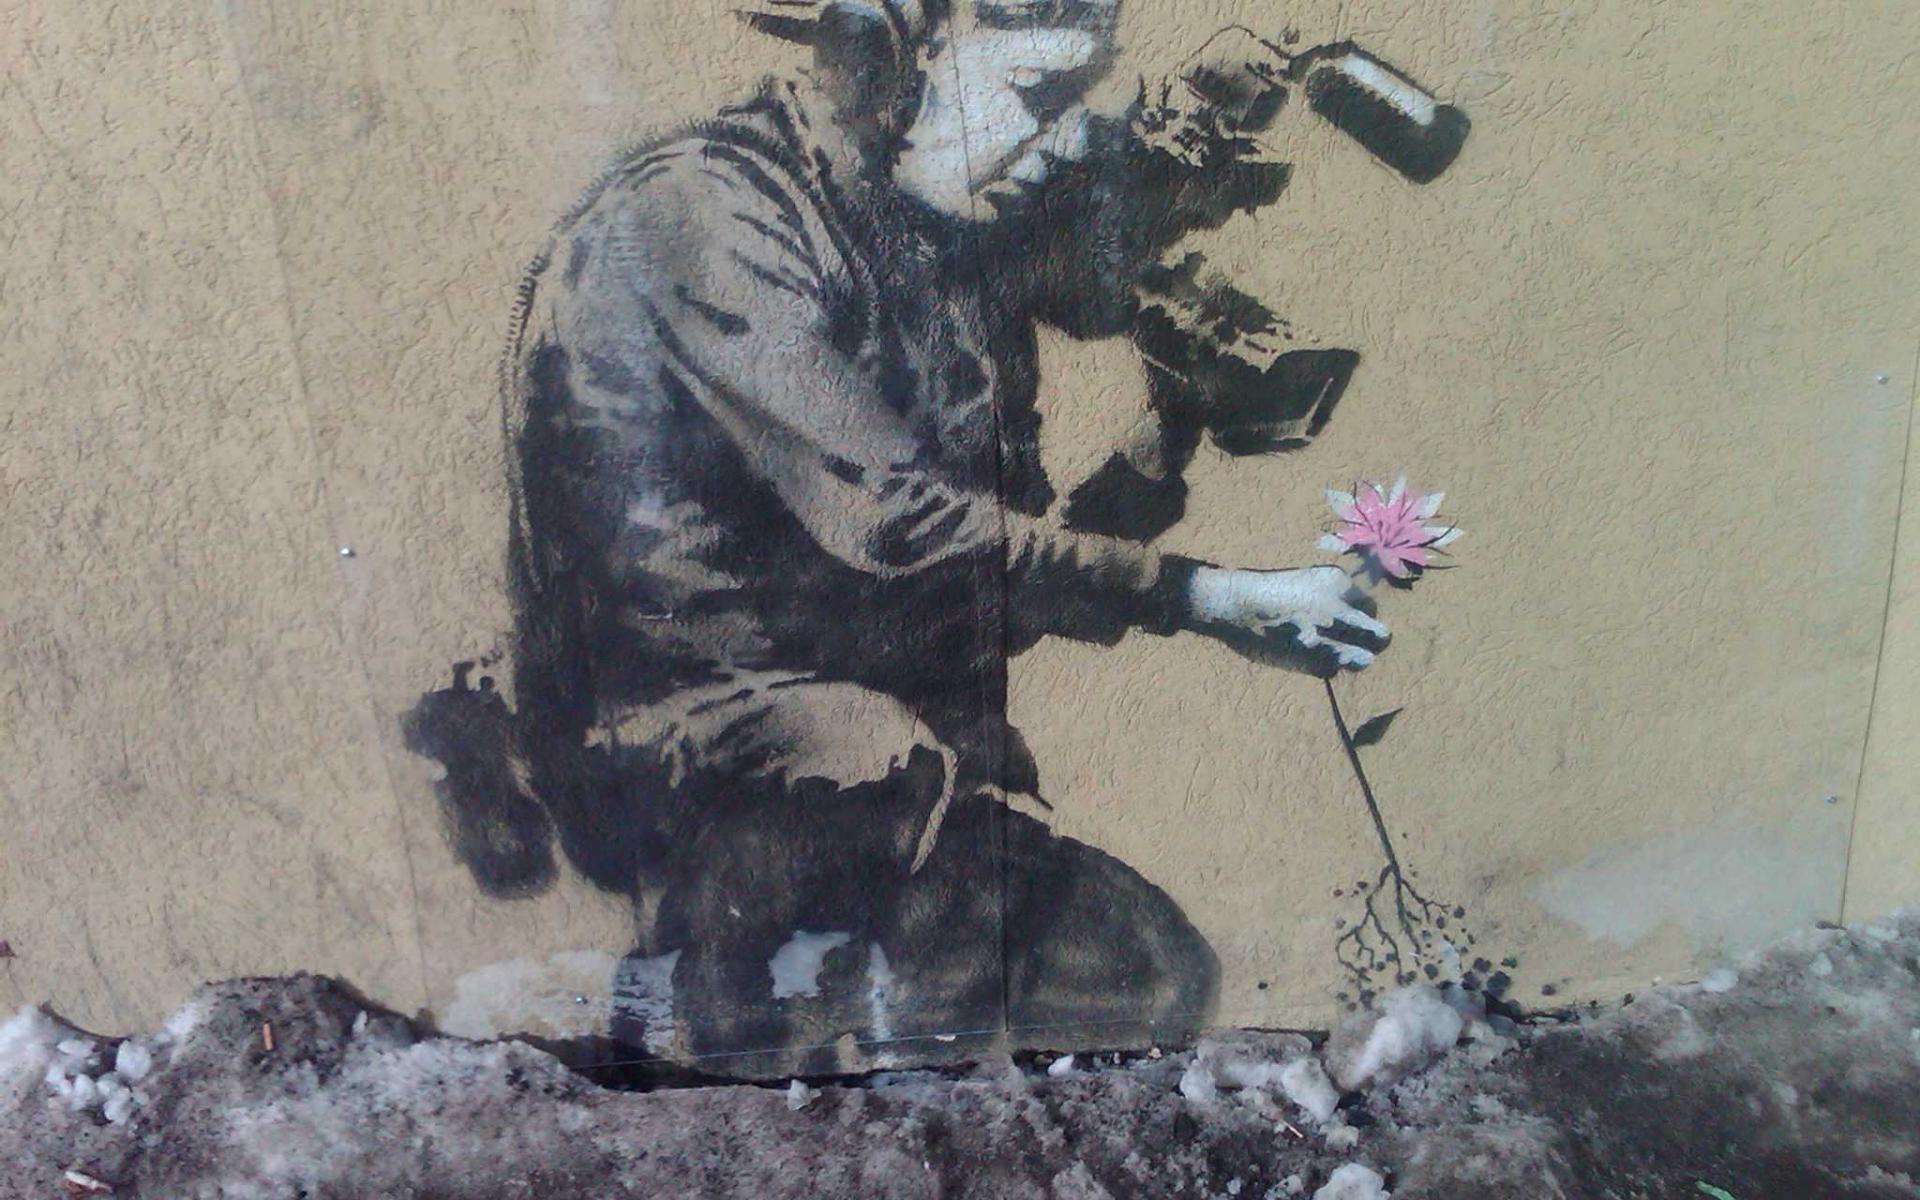 Best Girl Wallpapers Ever Banksy Wallpaper 1920x1080 73 Images